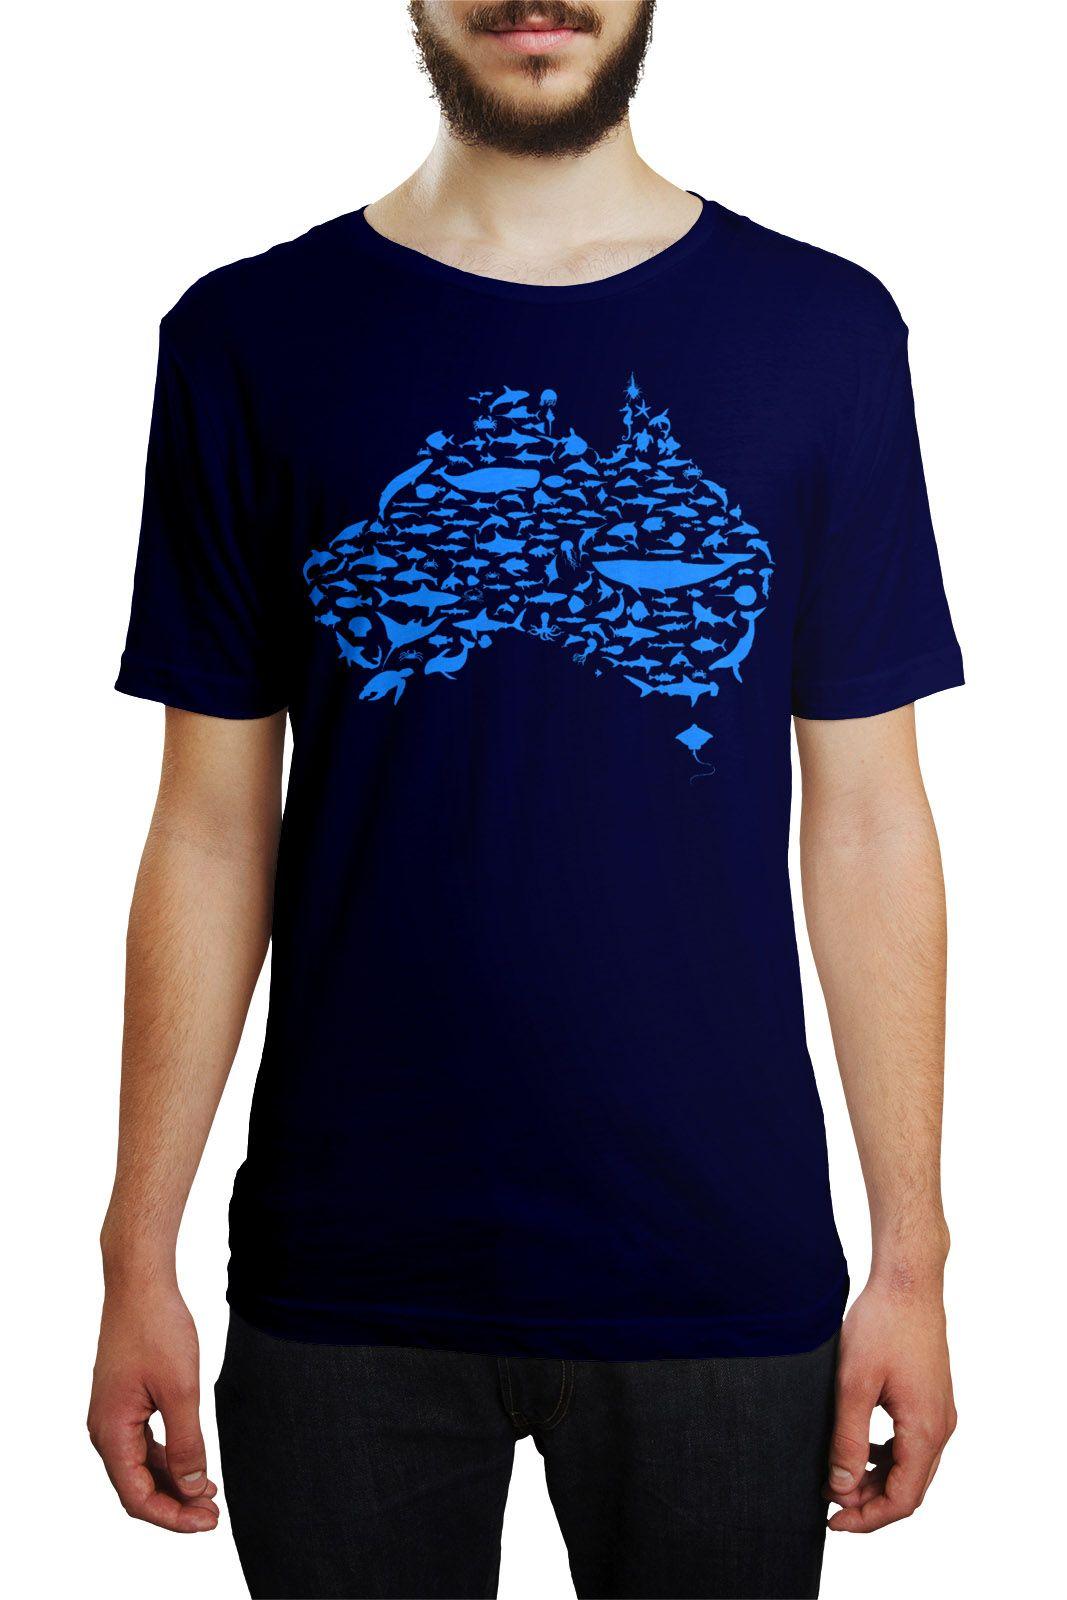 Camiseta HShop Australia Azul Marinho  - HShop